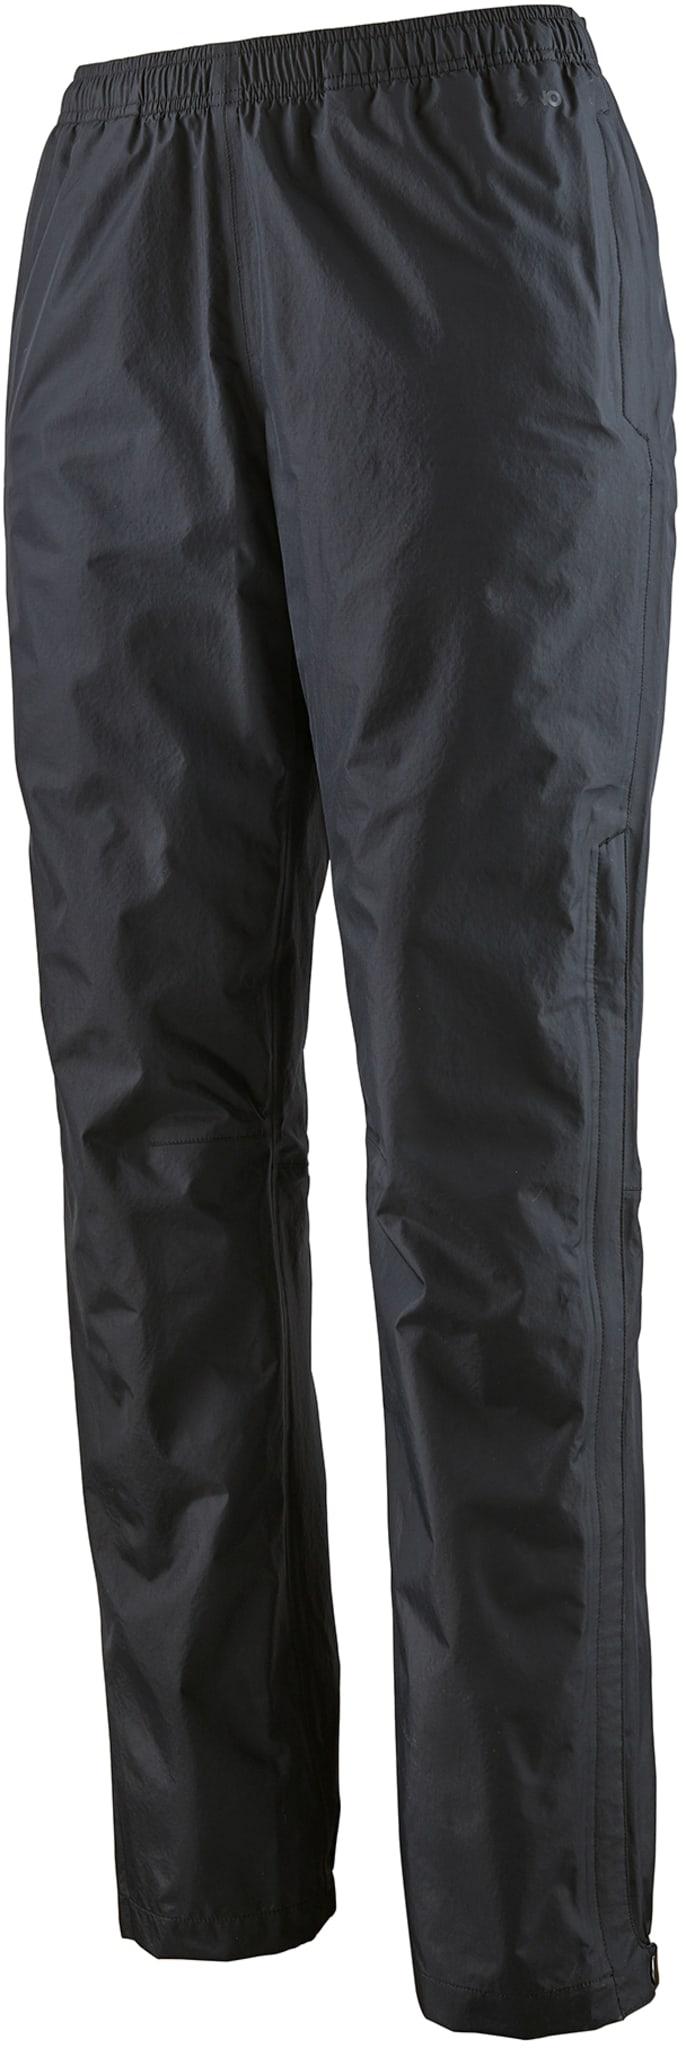 Torrentshell 3-Layer Pants Regular W